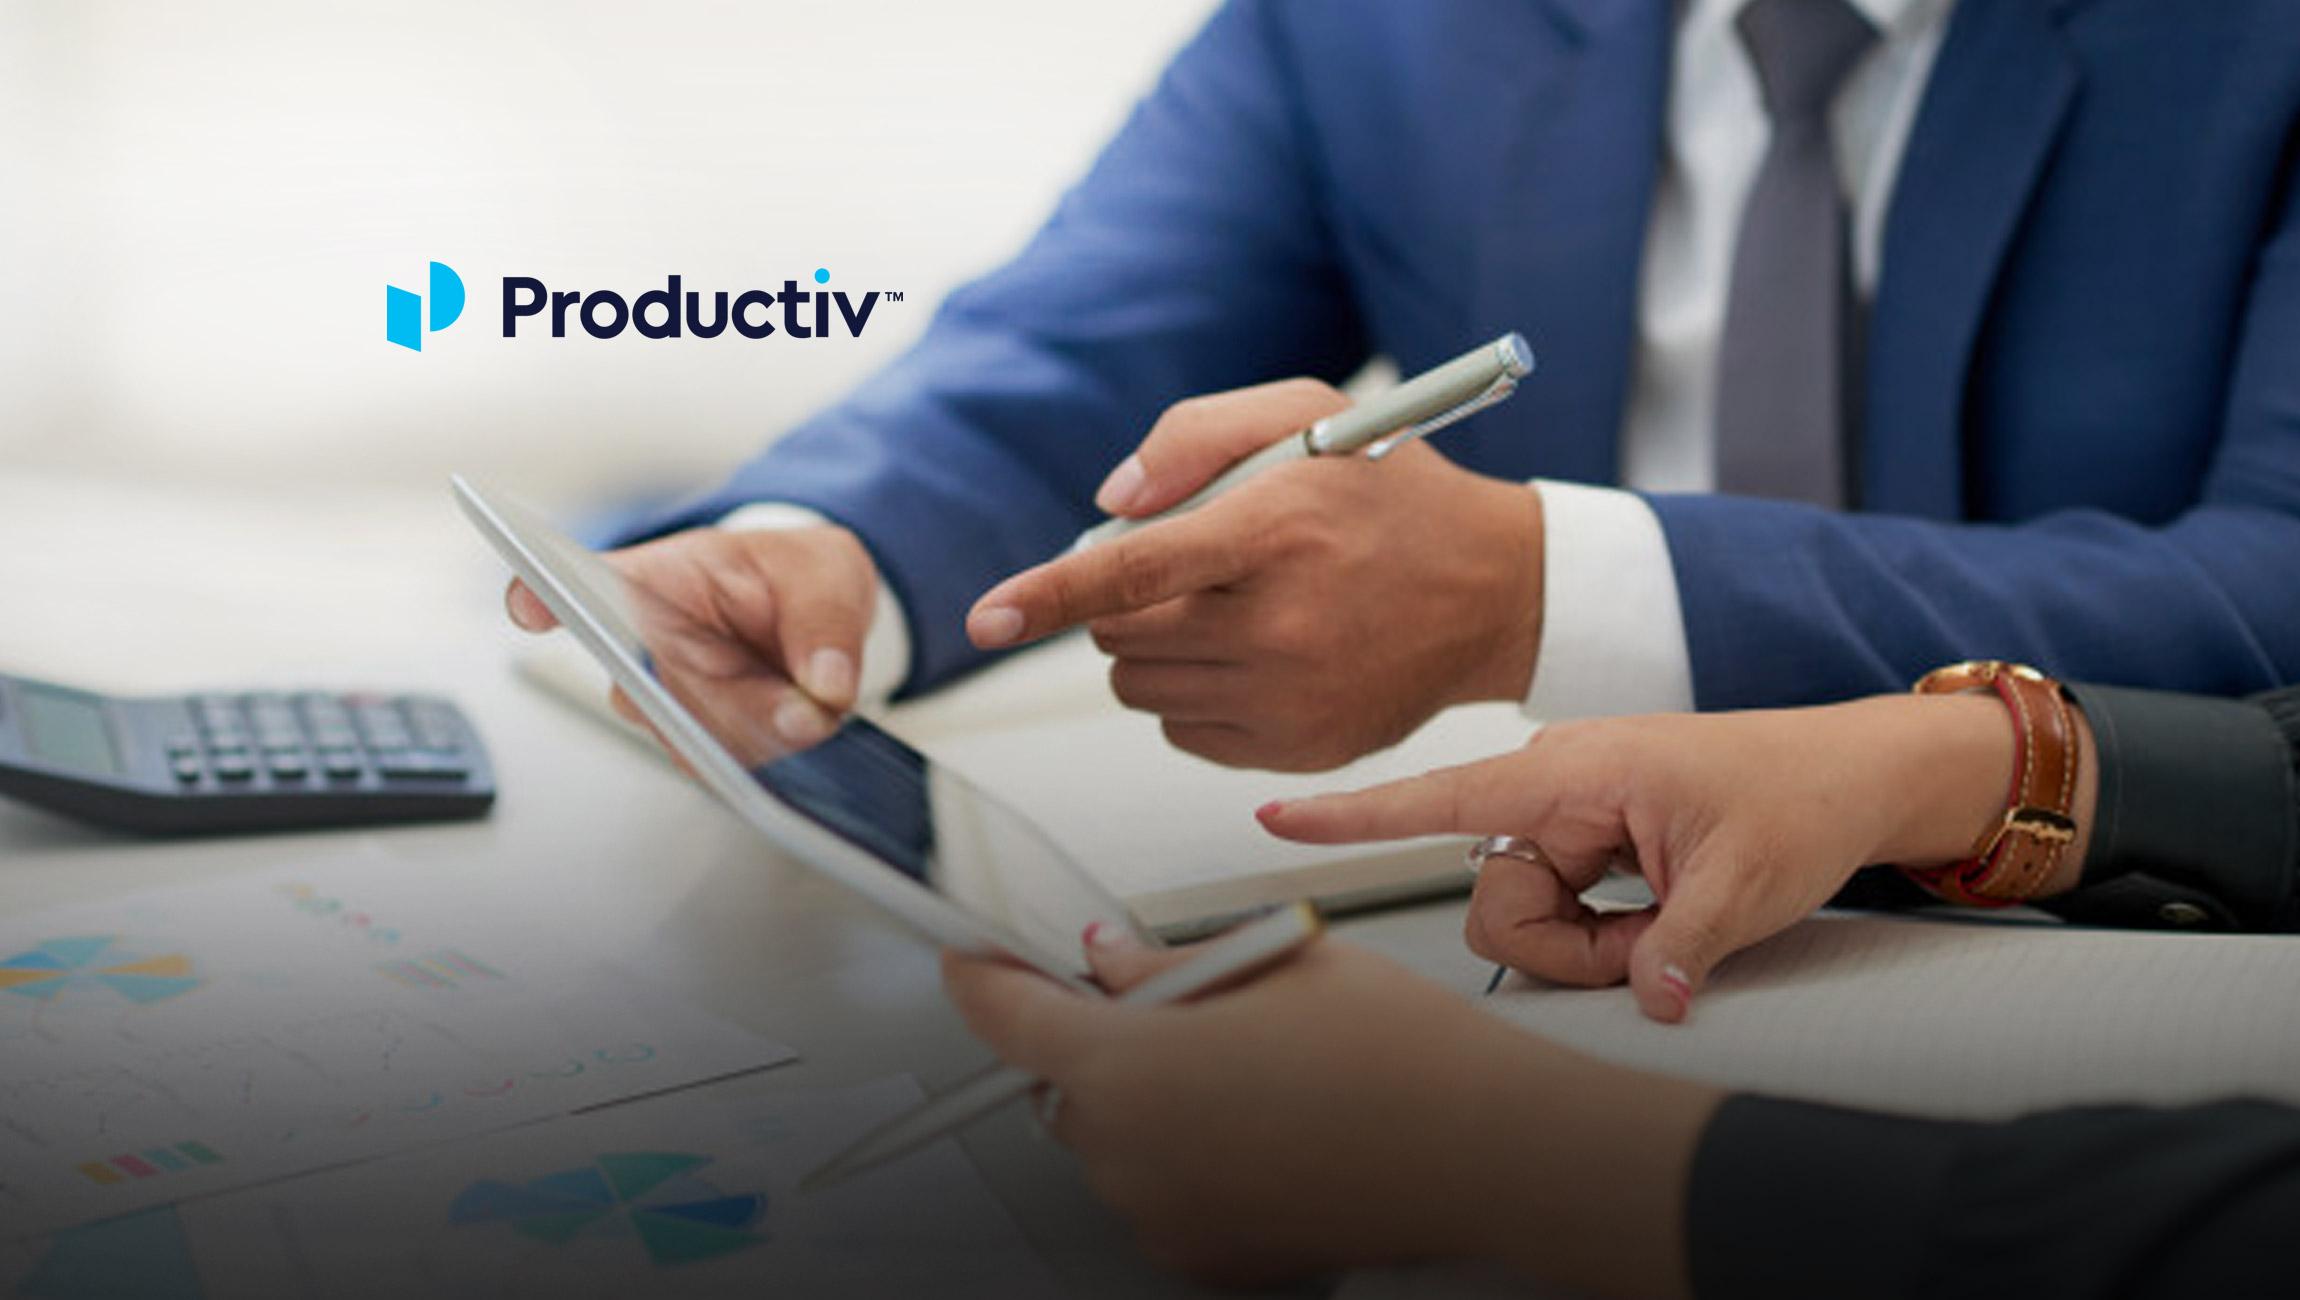 Productiv Expands Leadership Team, Announces Apurva Davé as Vice President of Marketing